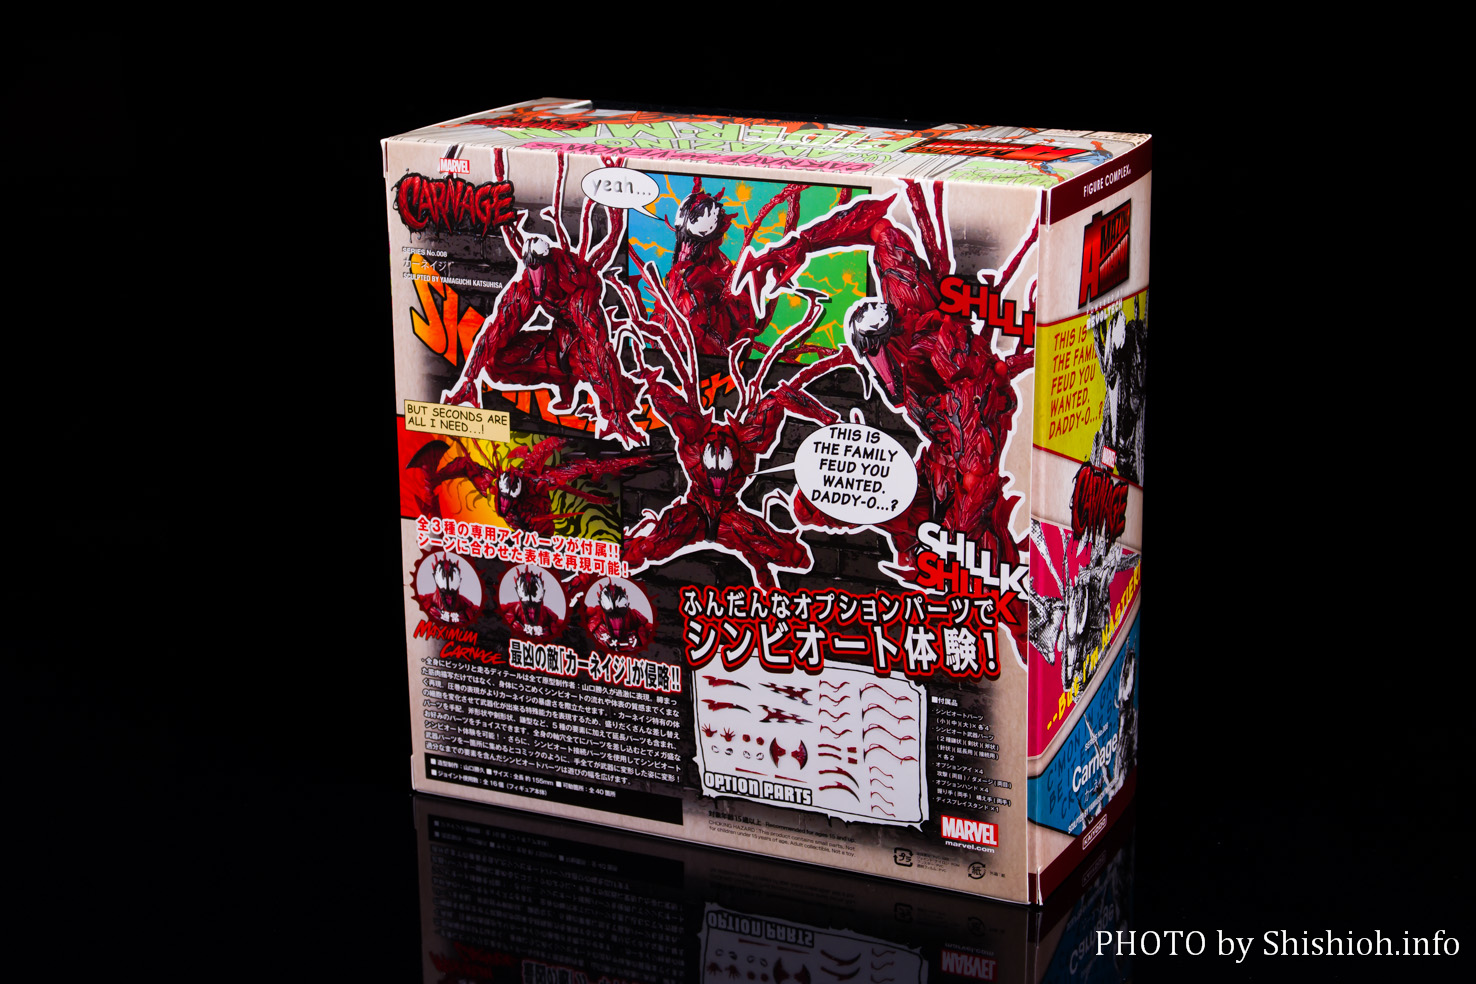 Amazing Yamaguchi 008 カーネイジ